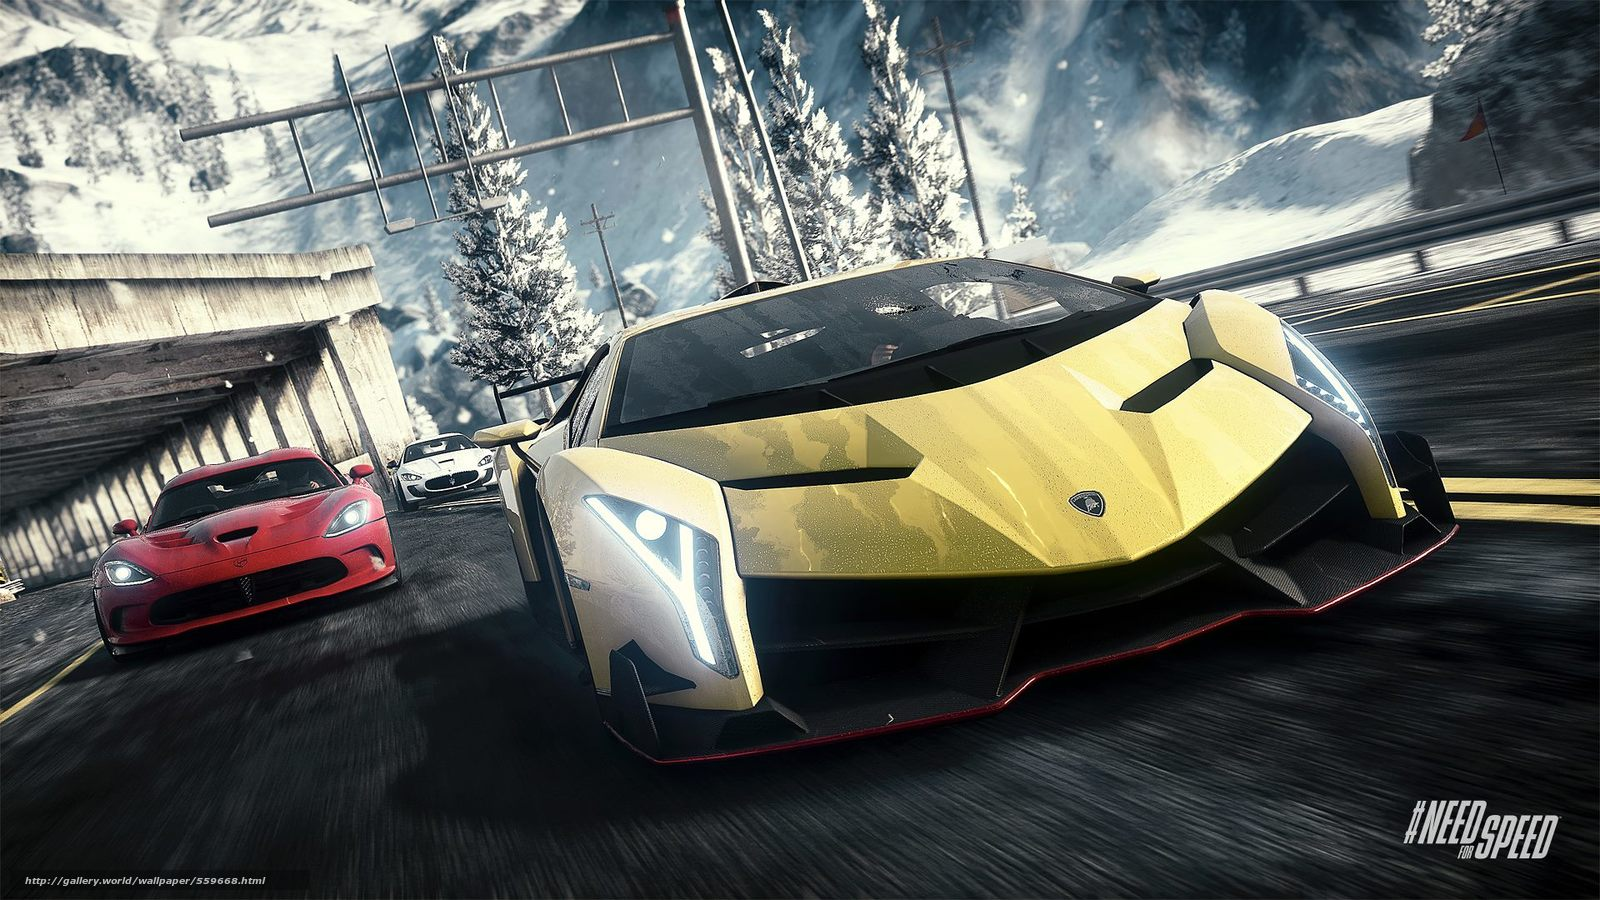 Download wallpaper Need for Speed  Rivals  Lamborghini Veneno  Dodge    Nfs Rivals Lamborghini